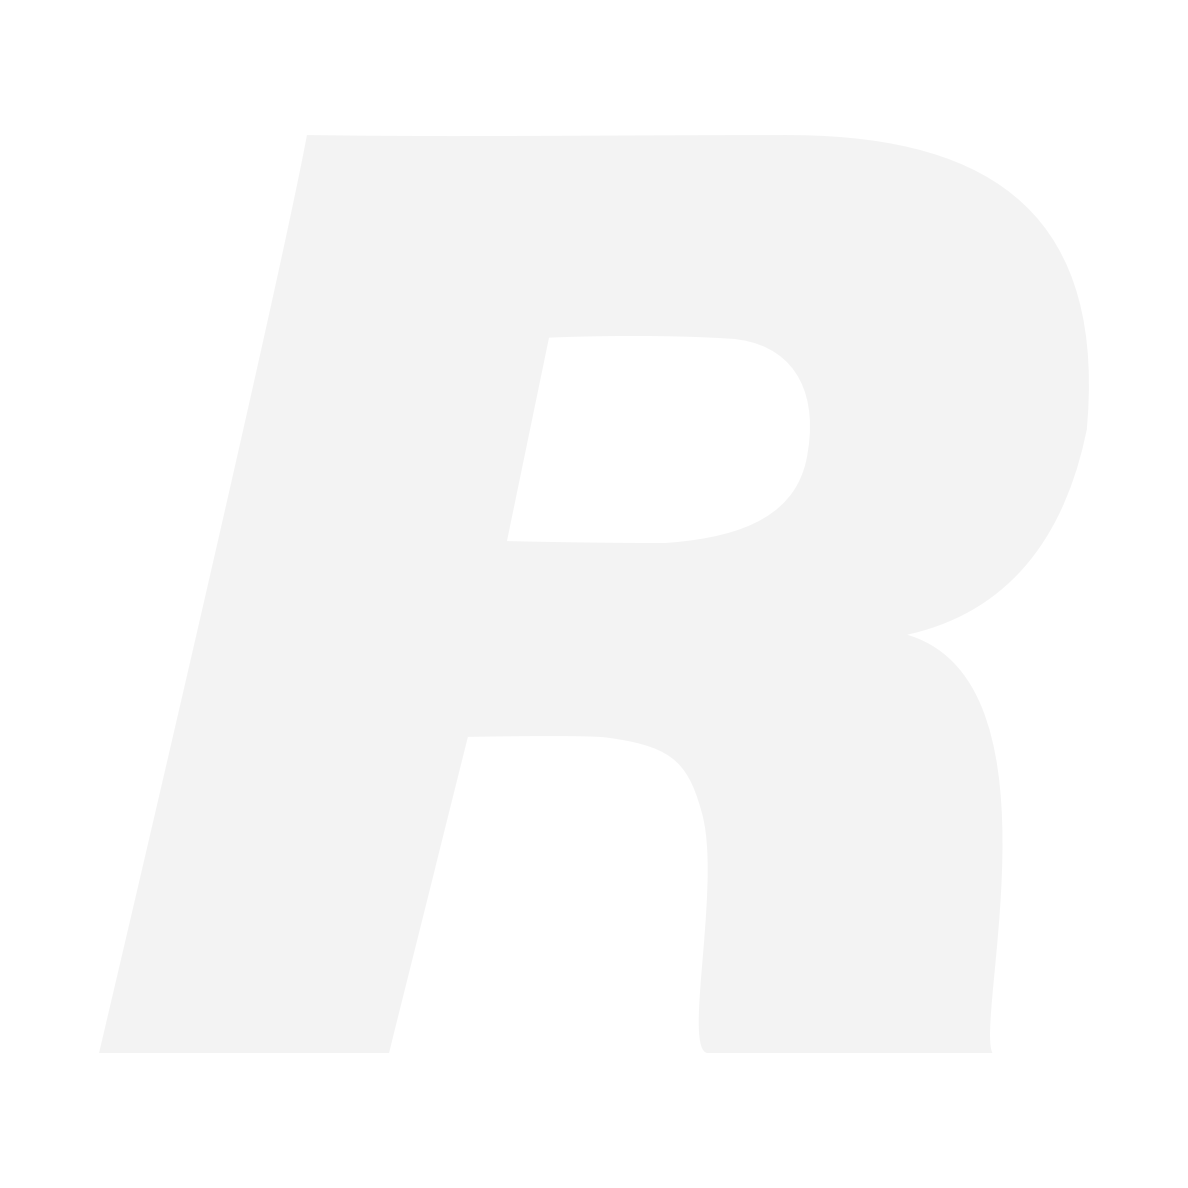 Rollei Sensor Cleaning Set for Full-Frame Cameras